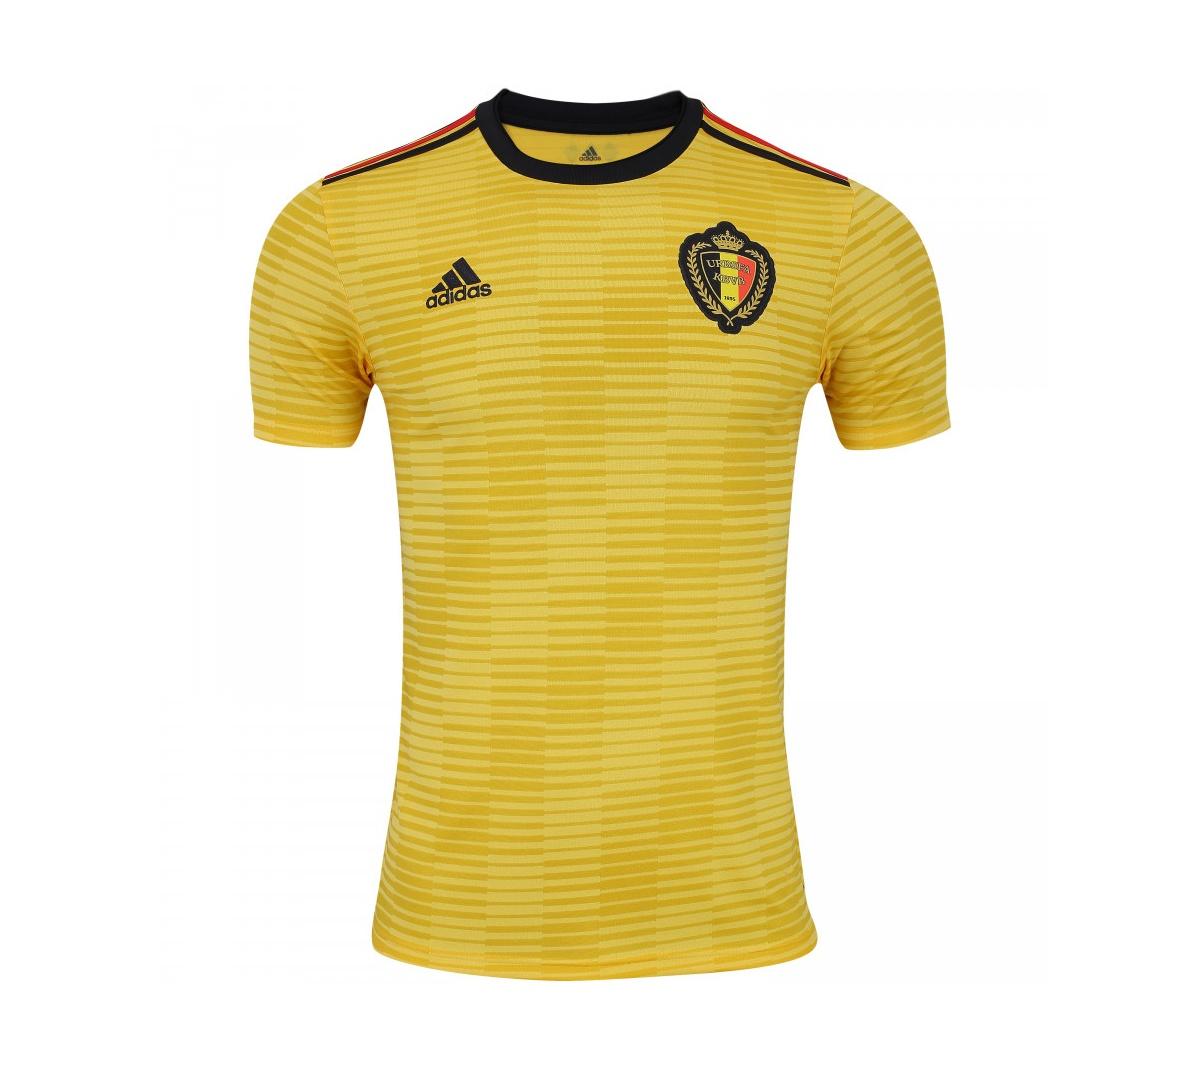 Camisa Adidas Bélgica II 2018 Torcedor Adulto Oficial